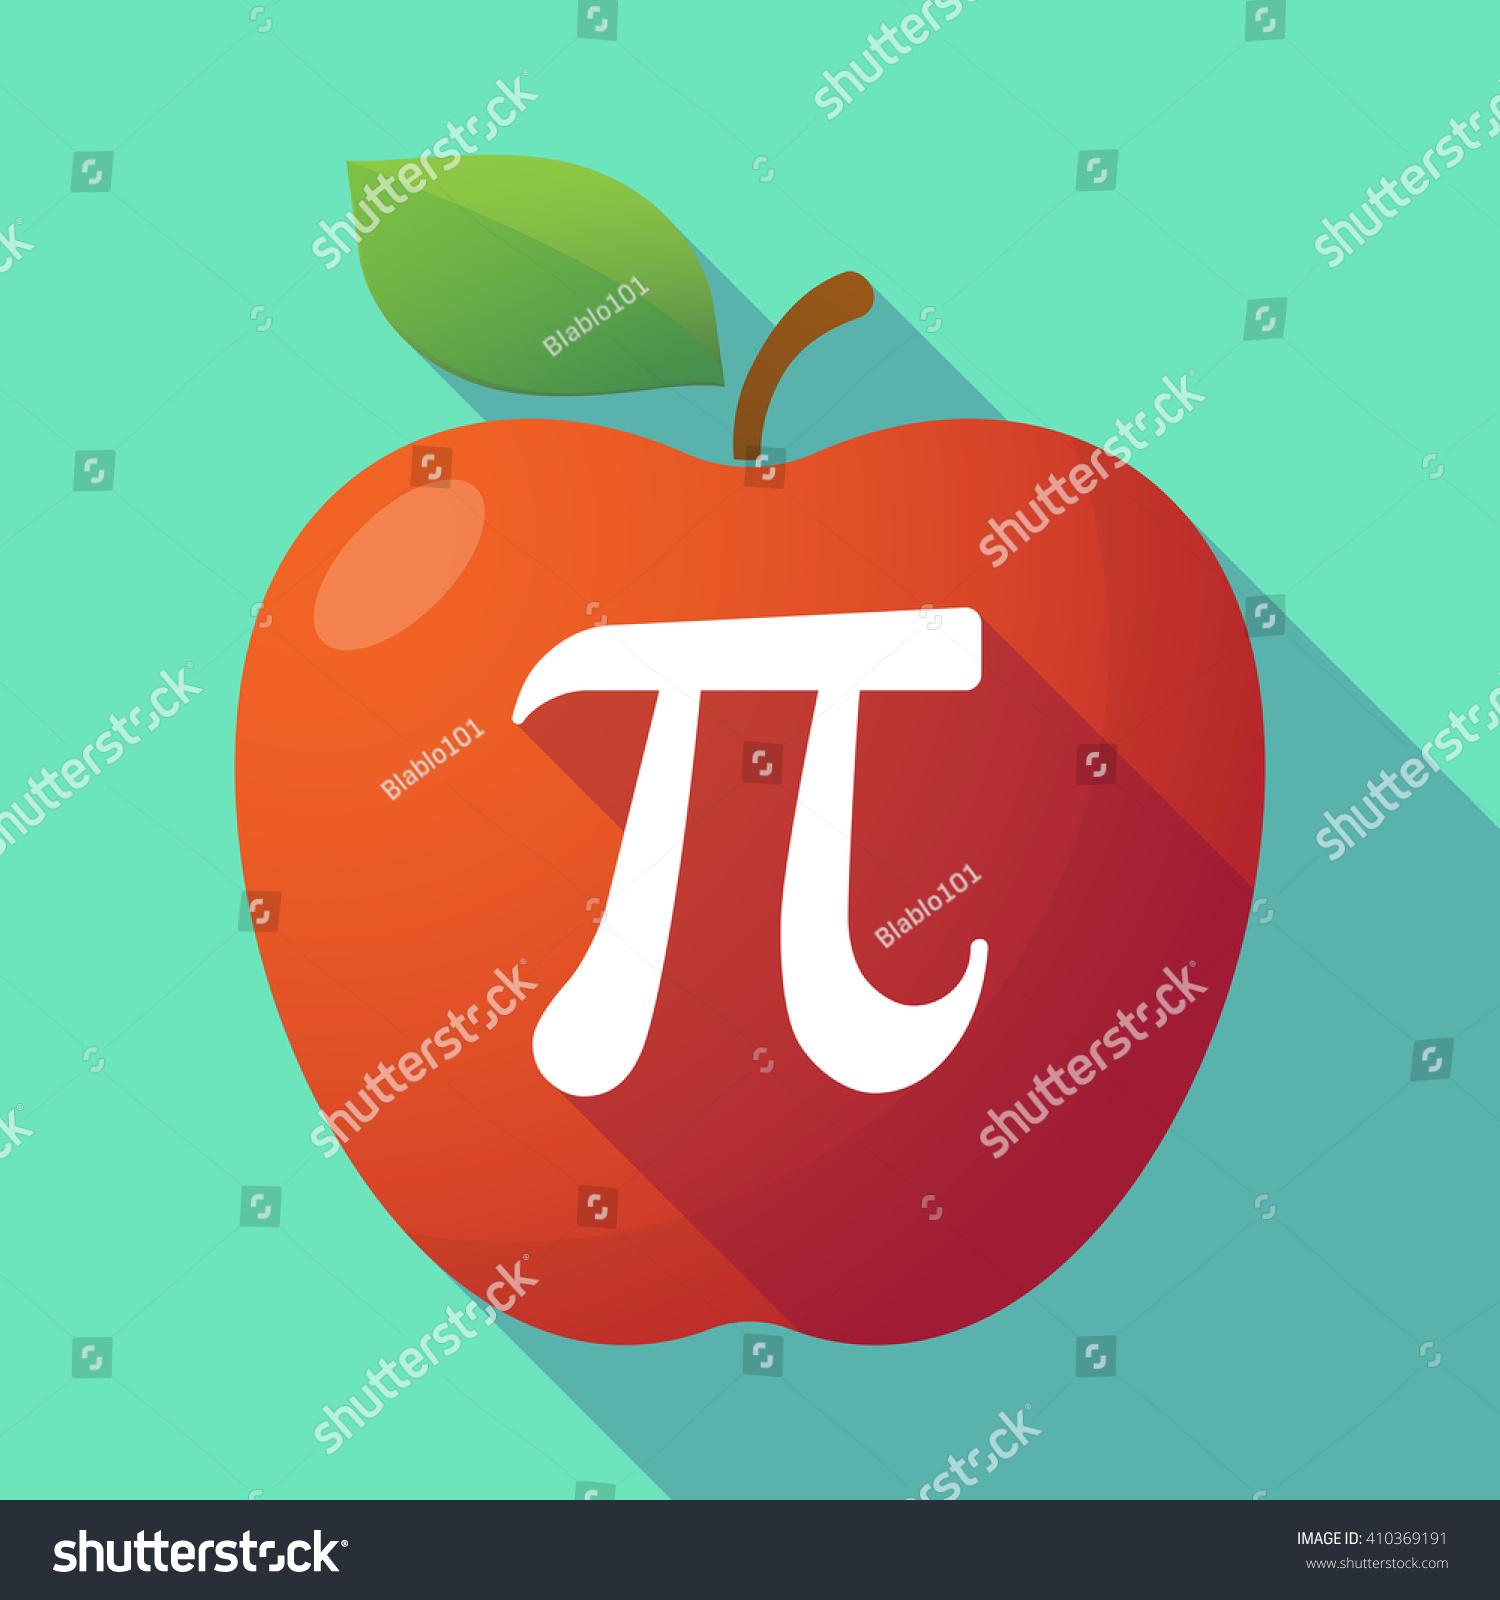 Illustration long shadow red apple number stock vector 410369191 illustration of a long shadow red apple with the number pi symbol buycottarizona